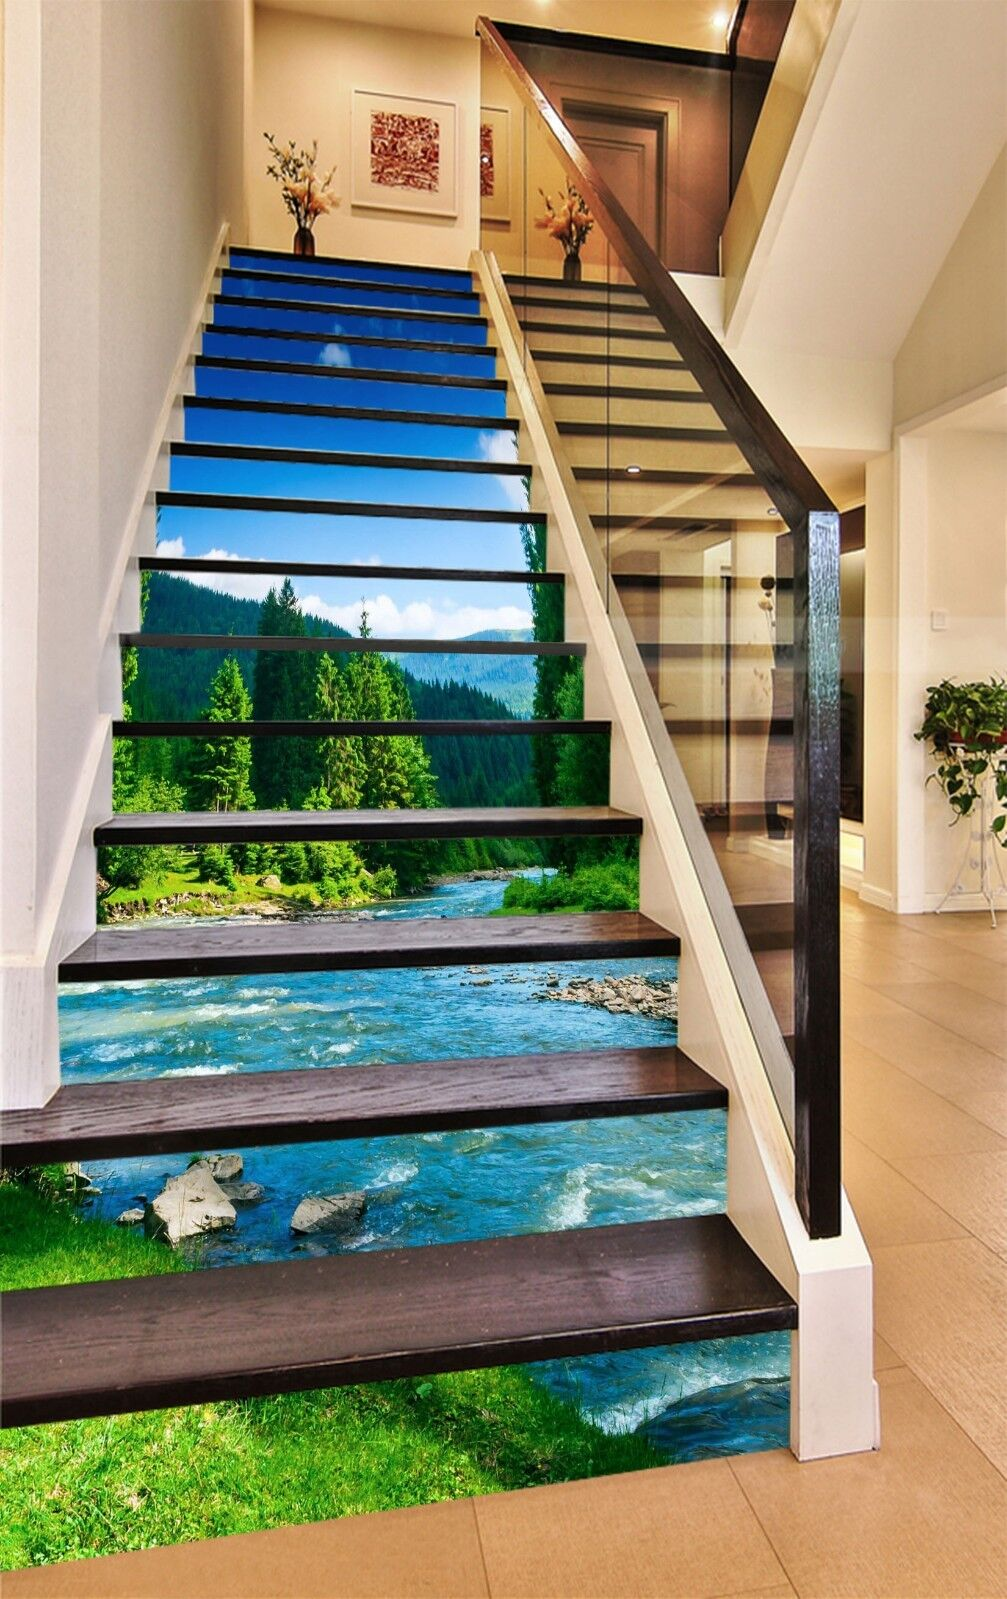 3D Sky mountain 7 Stair Risers Decoration Photo Mural Vinyl Decal Wallpaper UK